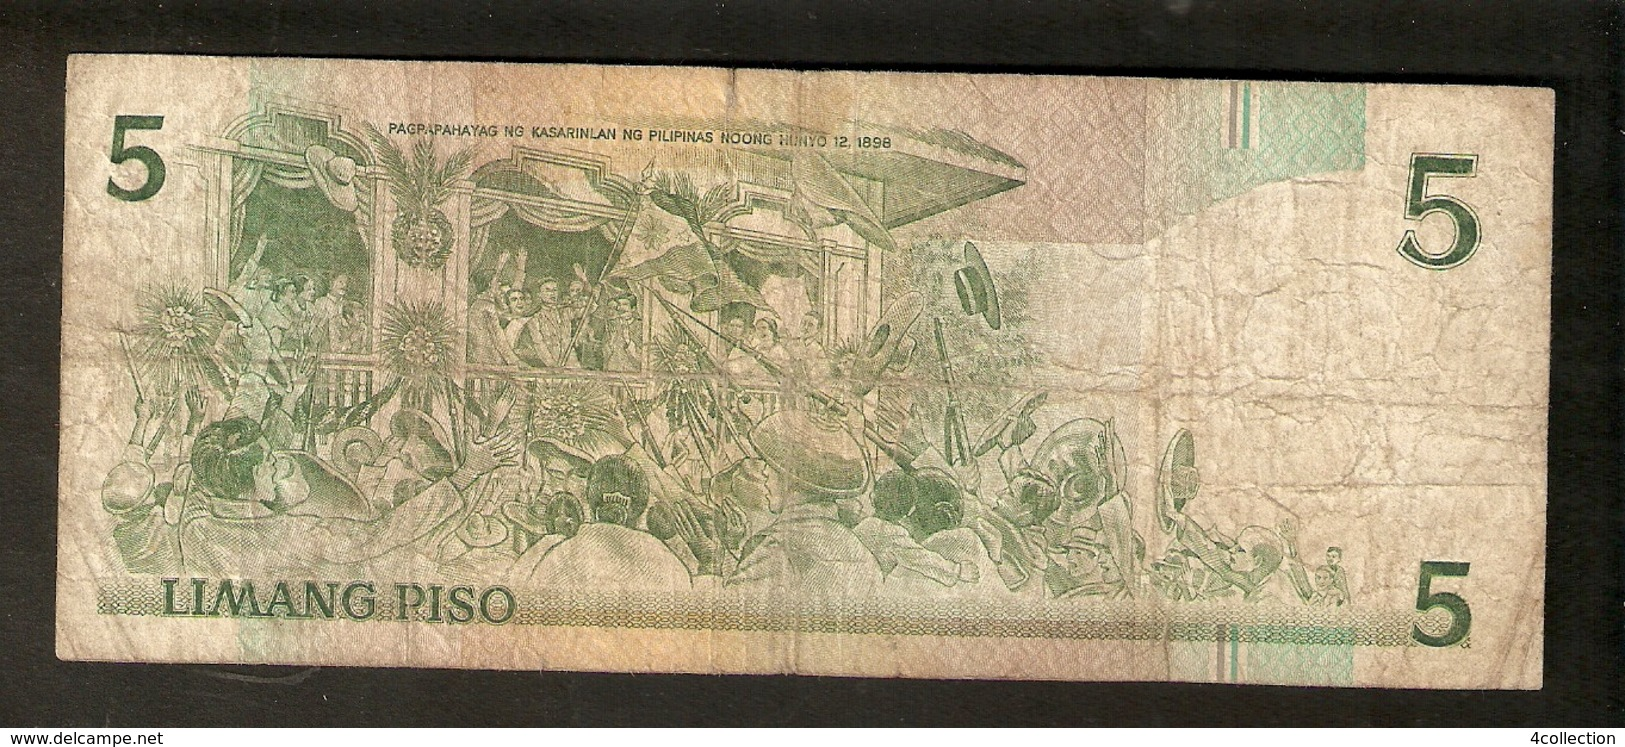 T. Philippines Republika Ng Pilipinas Limang Piso 5 Pesos ( 1956 ) Emilio Aguinaldo Ser. PY 341896 - Philippines